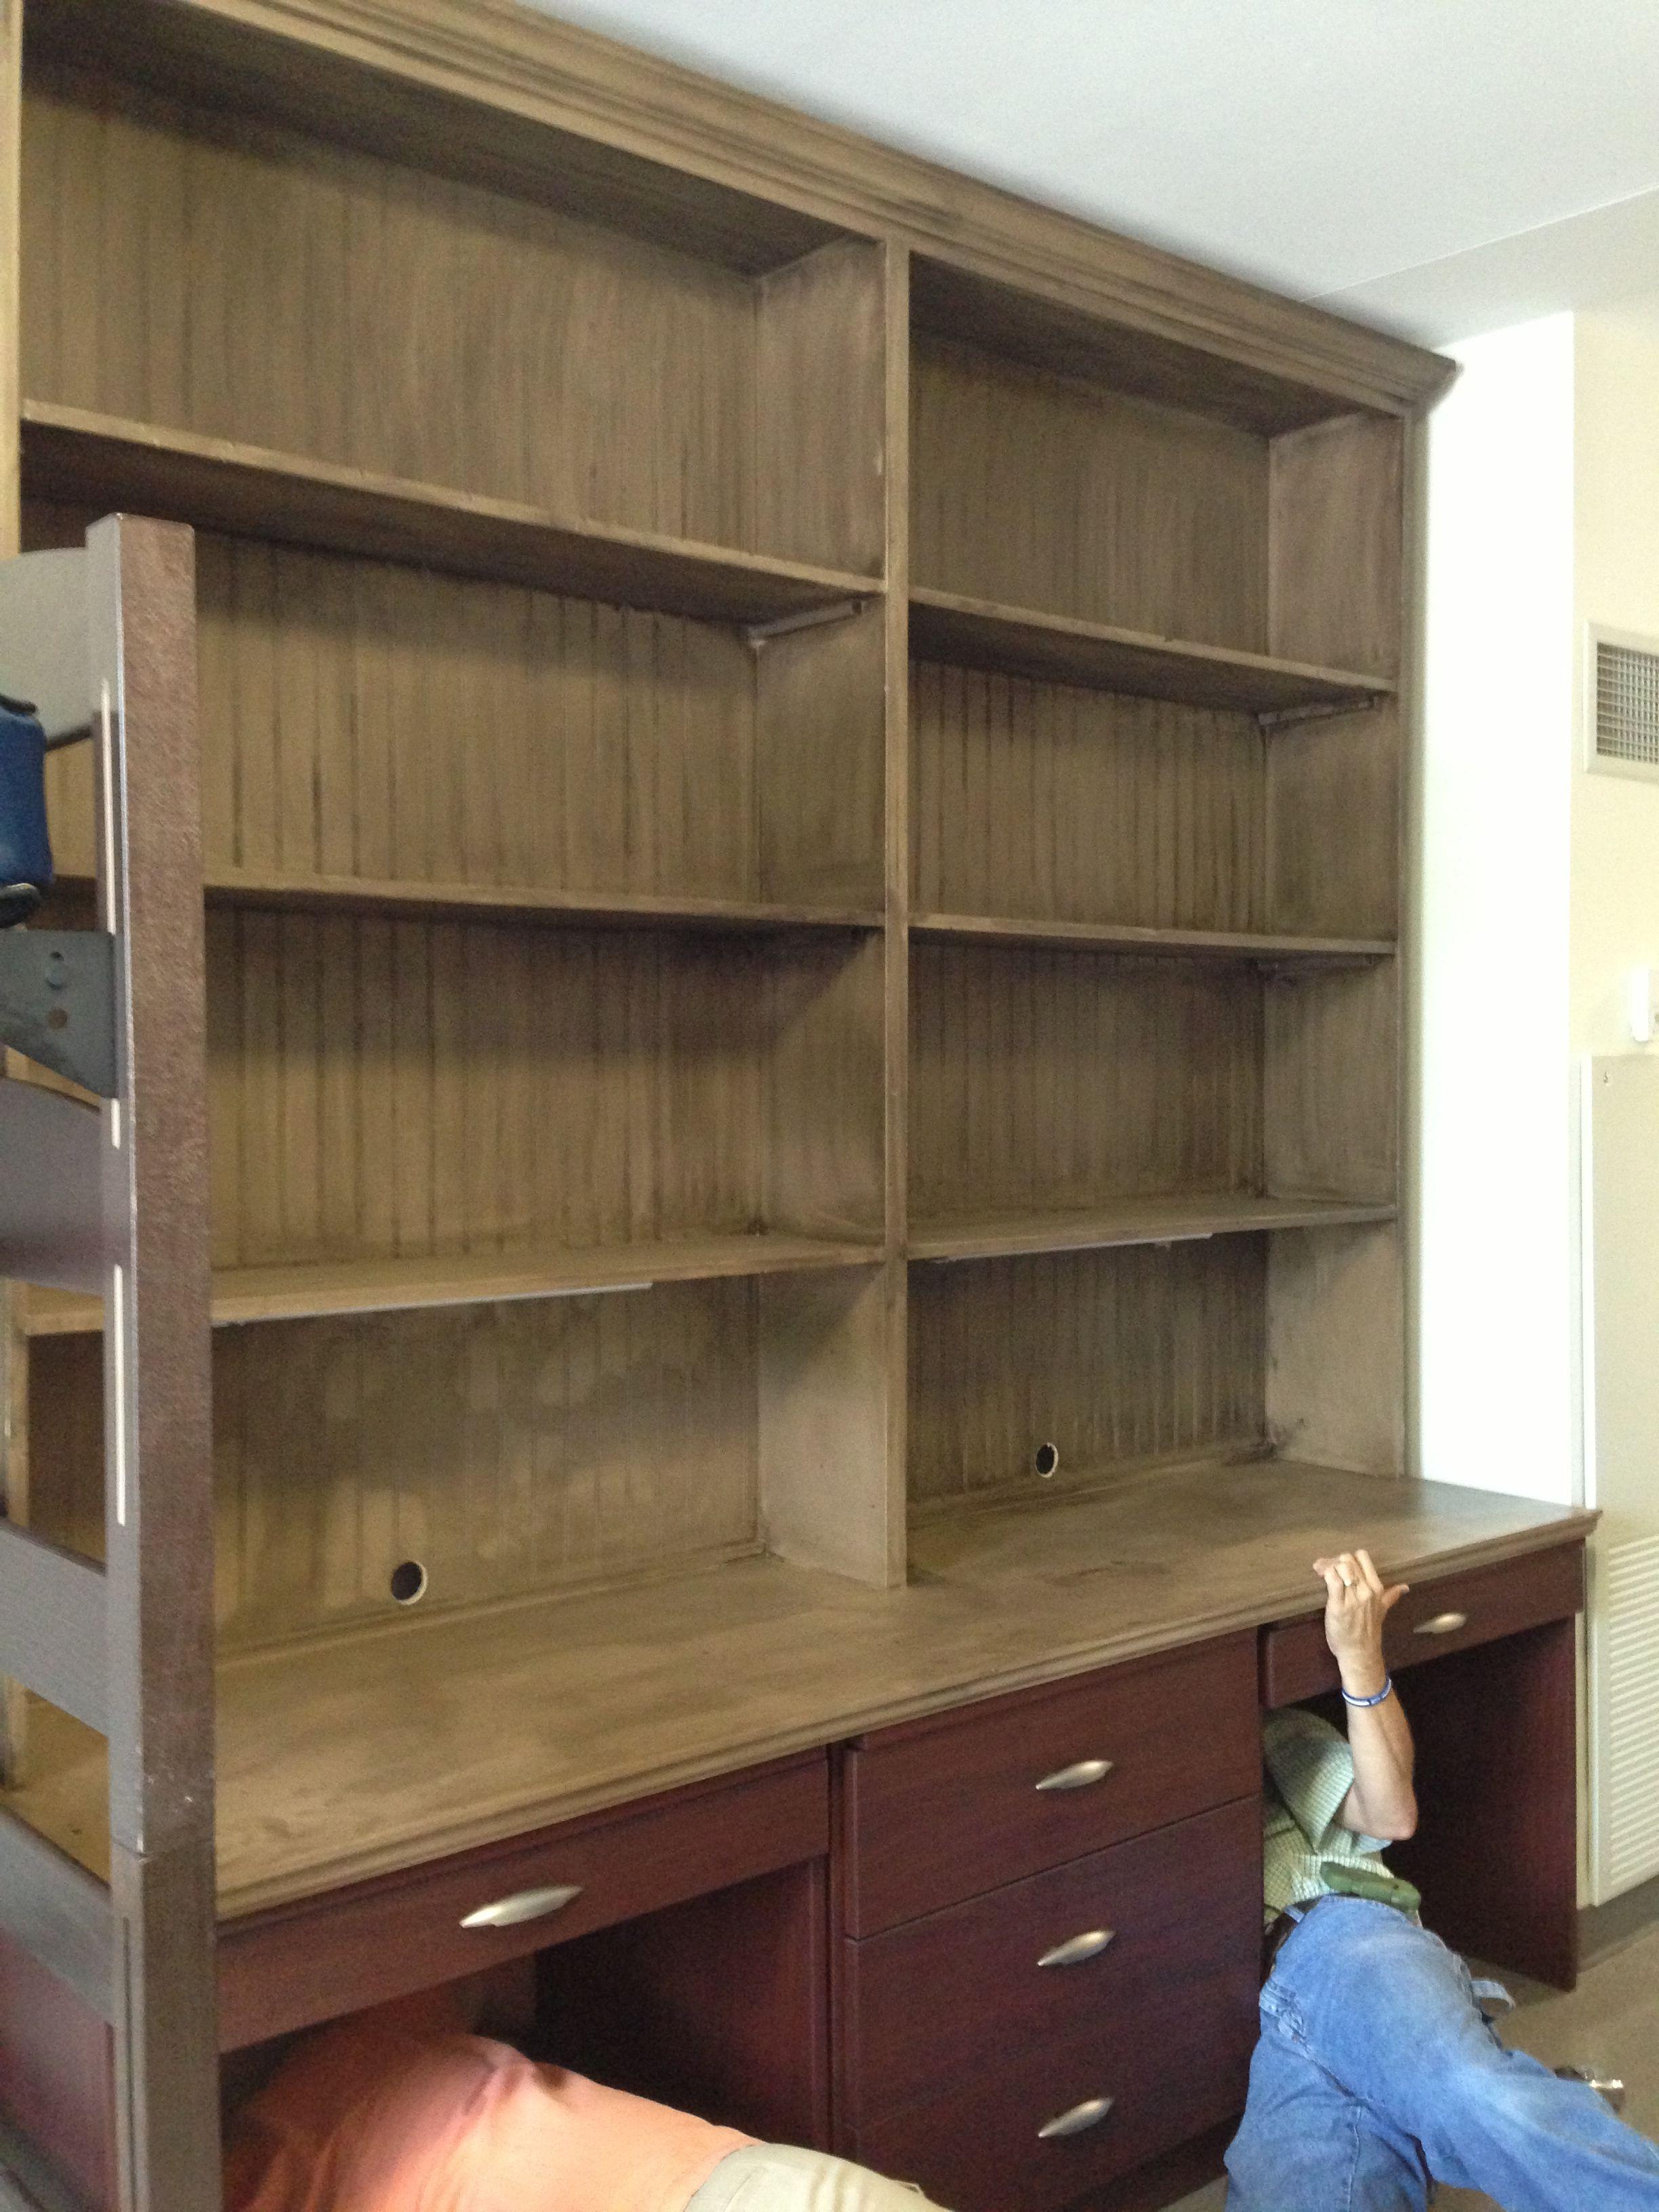 Dorm Room Custom Made Furniture To Fit Snuggly On Top Of The Desk, Dresser  · Do HomeworkOle MissDorm ...